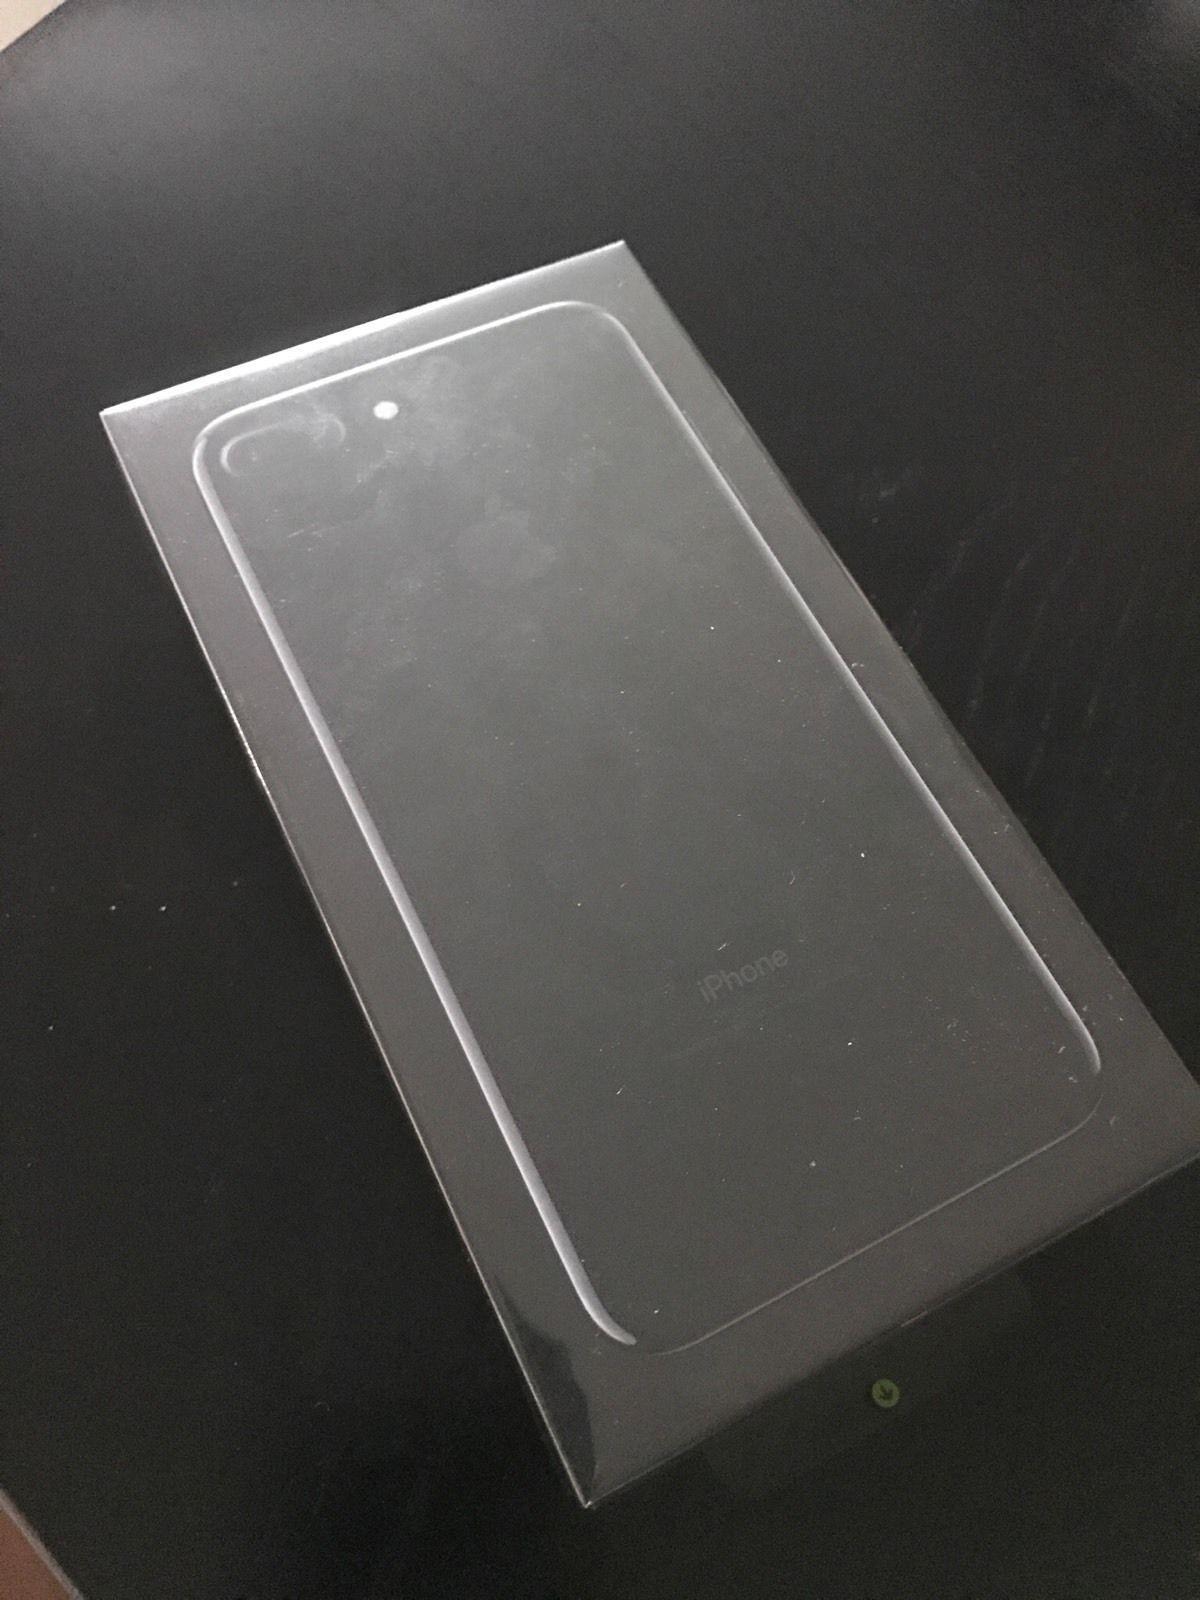 Unlocked Apple Iphone 7 Plus Jet Black 256gb T Mobile Jetblack